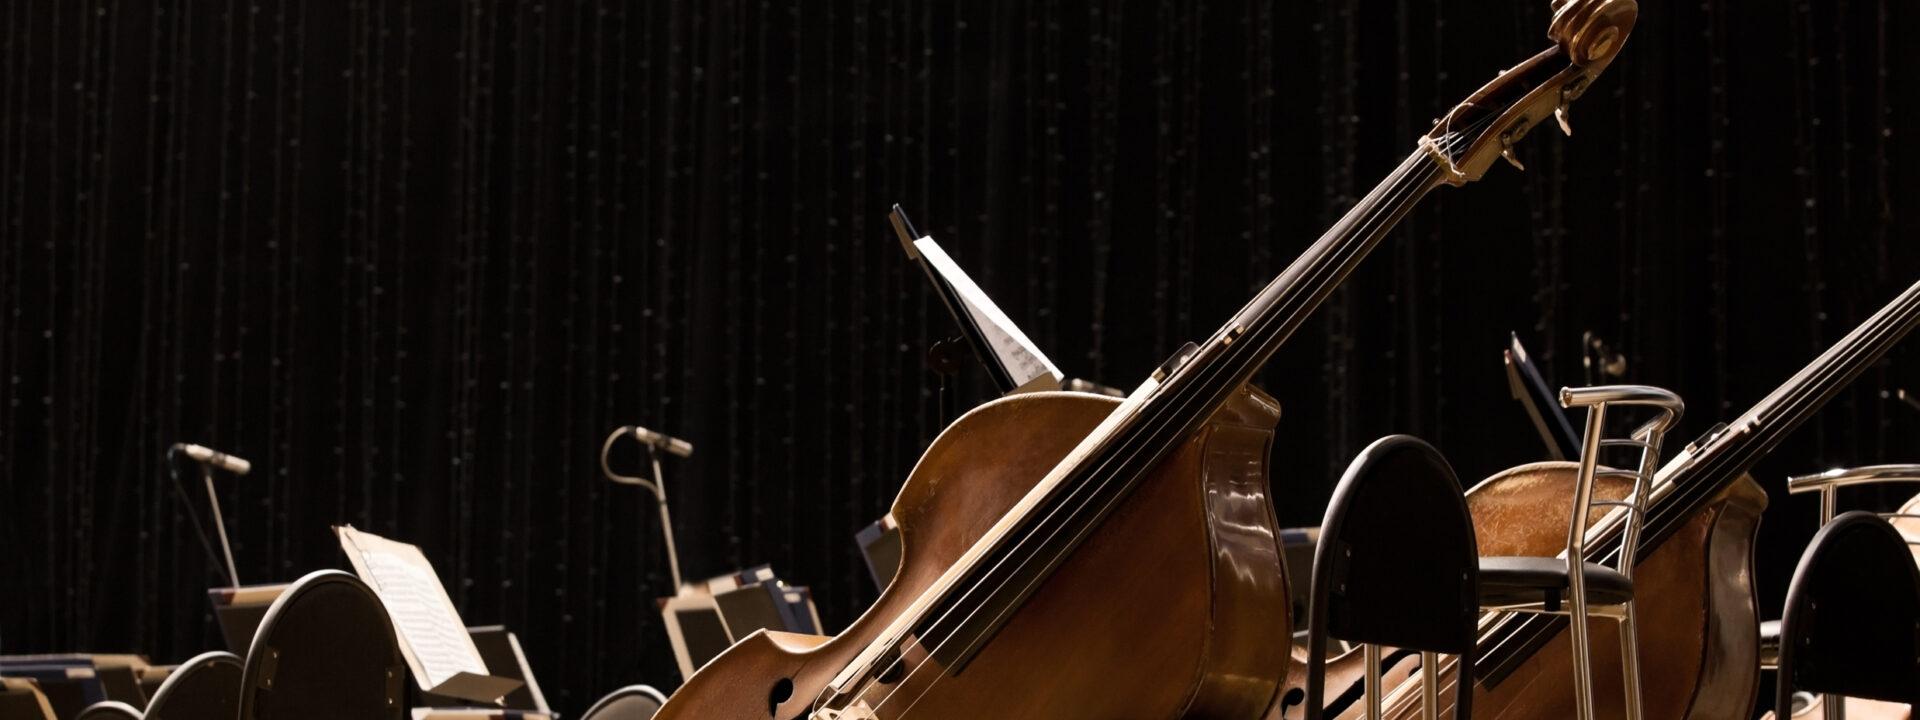 Muzikaal behang met impact